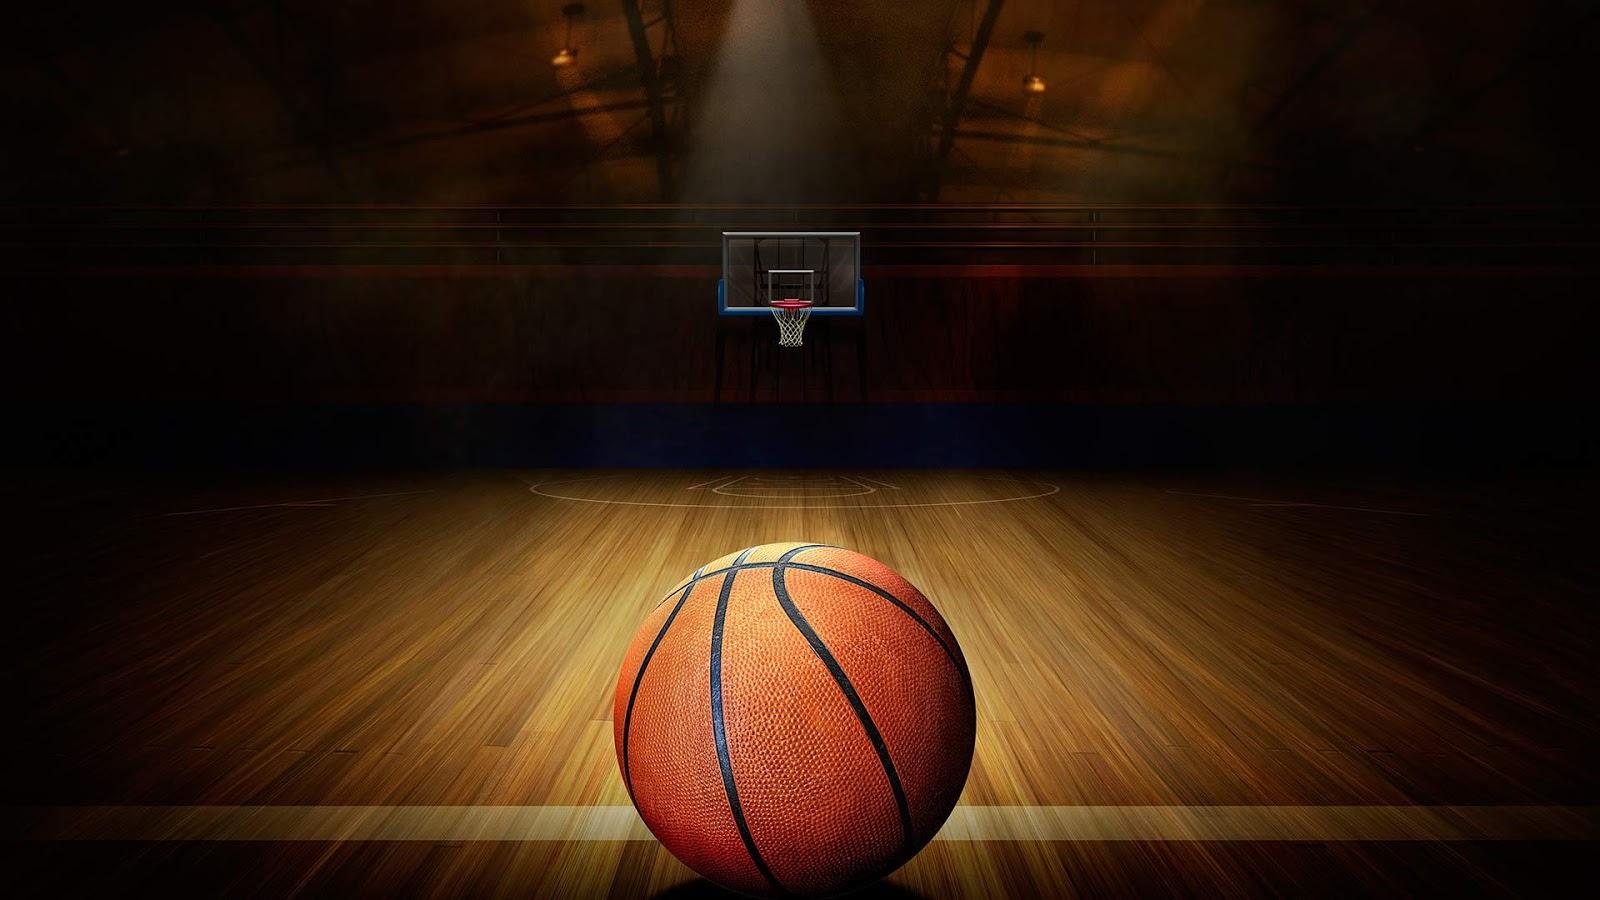 Cool Basketball Wallpaper 41592 42568 Hd Wallpapers South Baldwin Christian Academy Accredited Private School Gulf Shores Foley Orange Beach Al